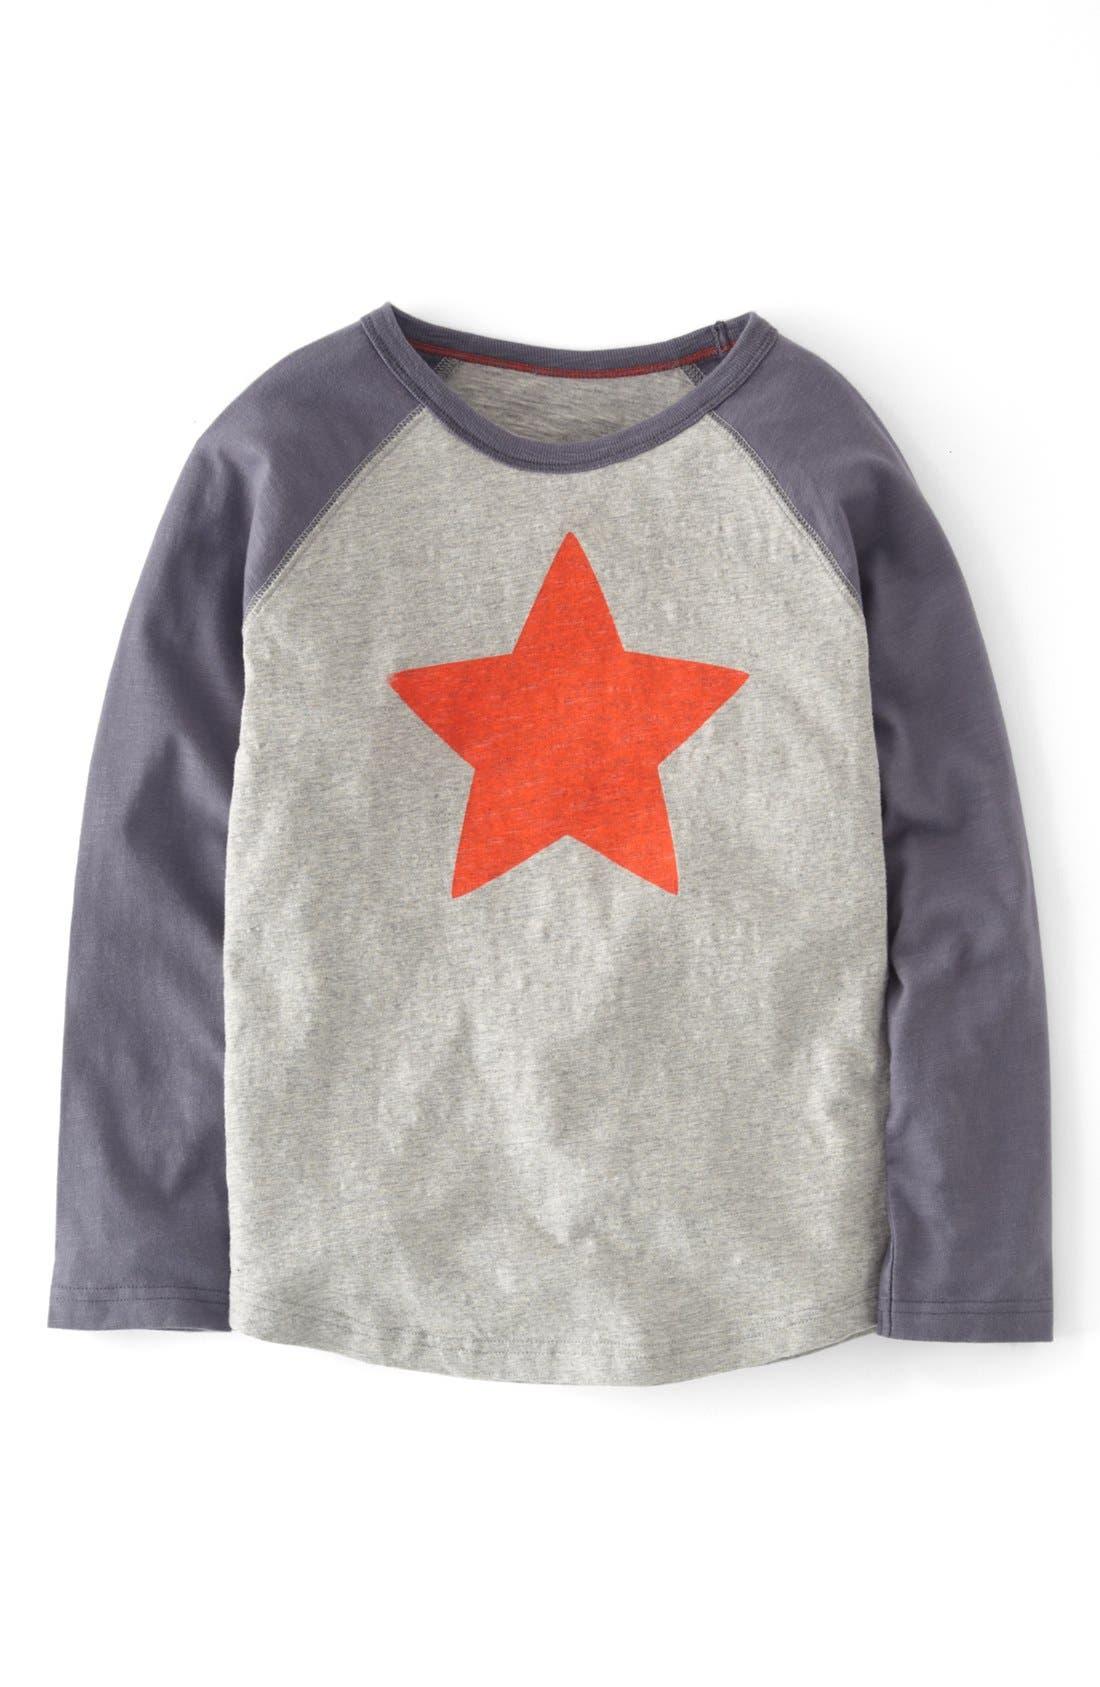 Alternate Image 1 Selected - Mini Boden Raglan Sleeve T-Shirt (Toddler Boys, Little Boys & Big Boys)